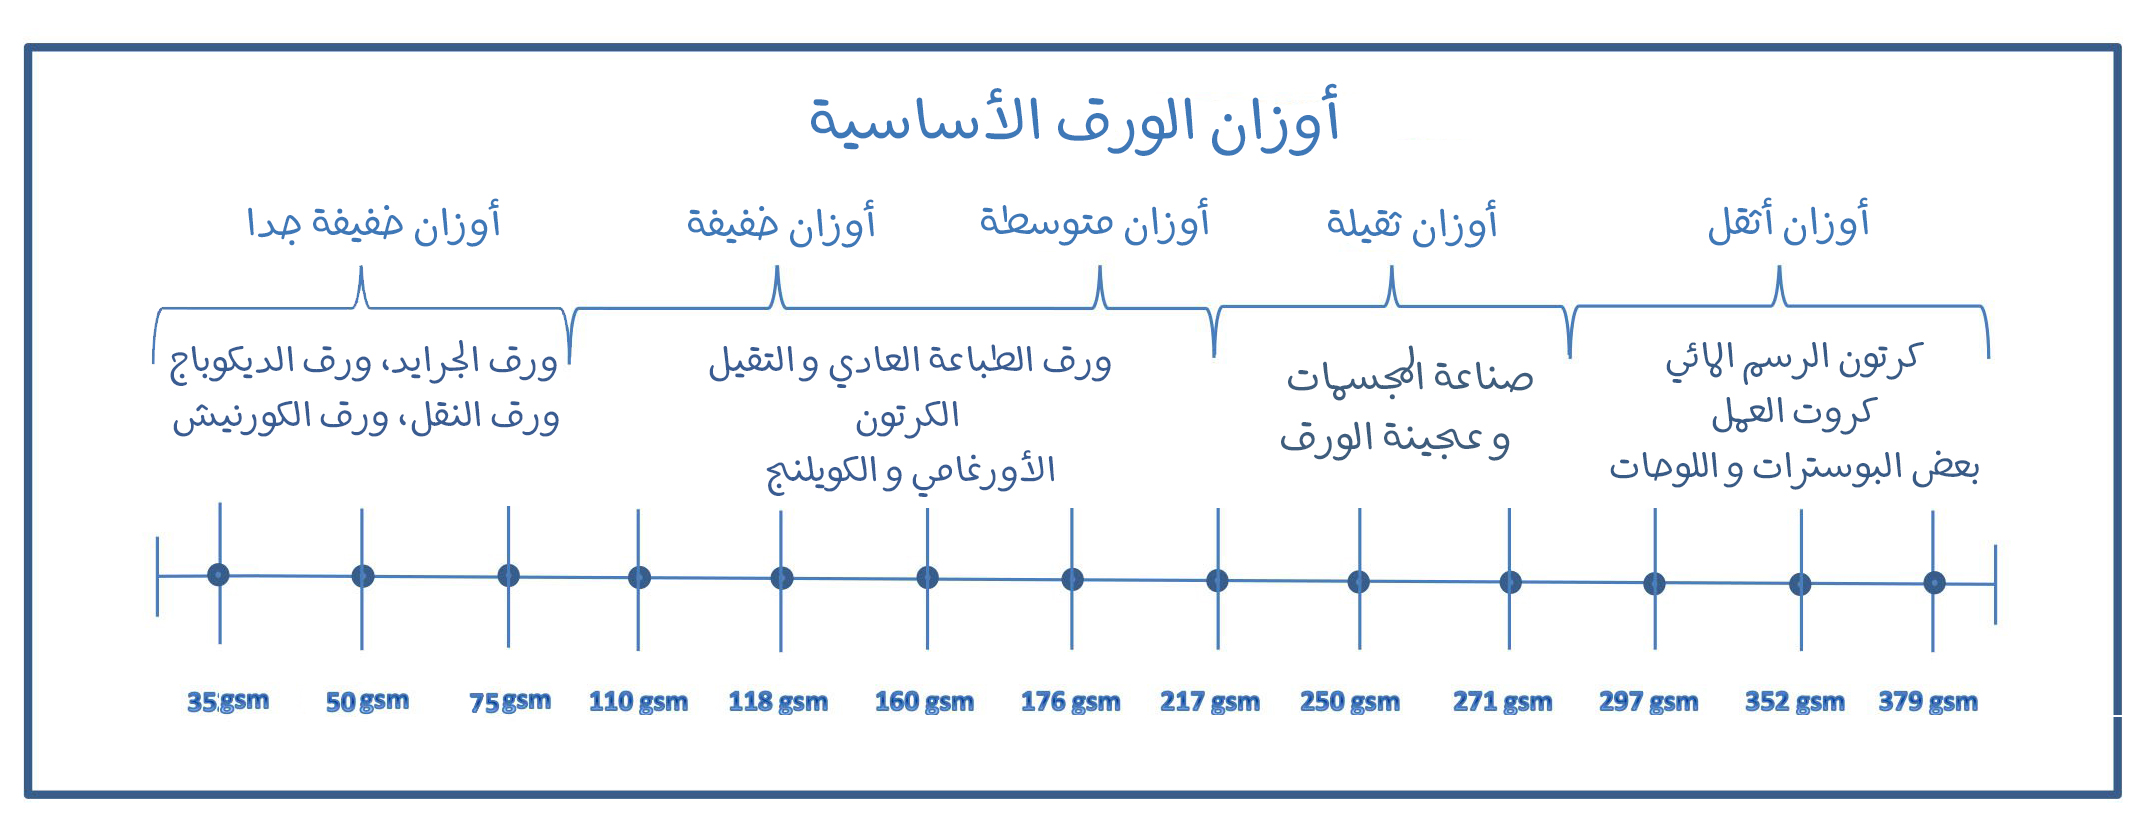 Paper_Basis_Weight_Chart_ddeef515-b3c7-4548-97e2-b88c6a0744bf_2048x2048 (1) copy